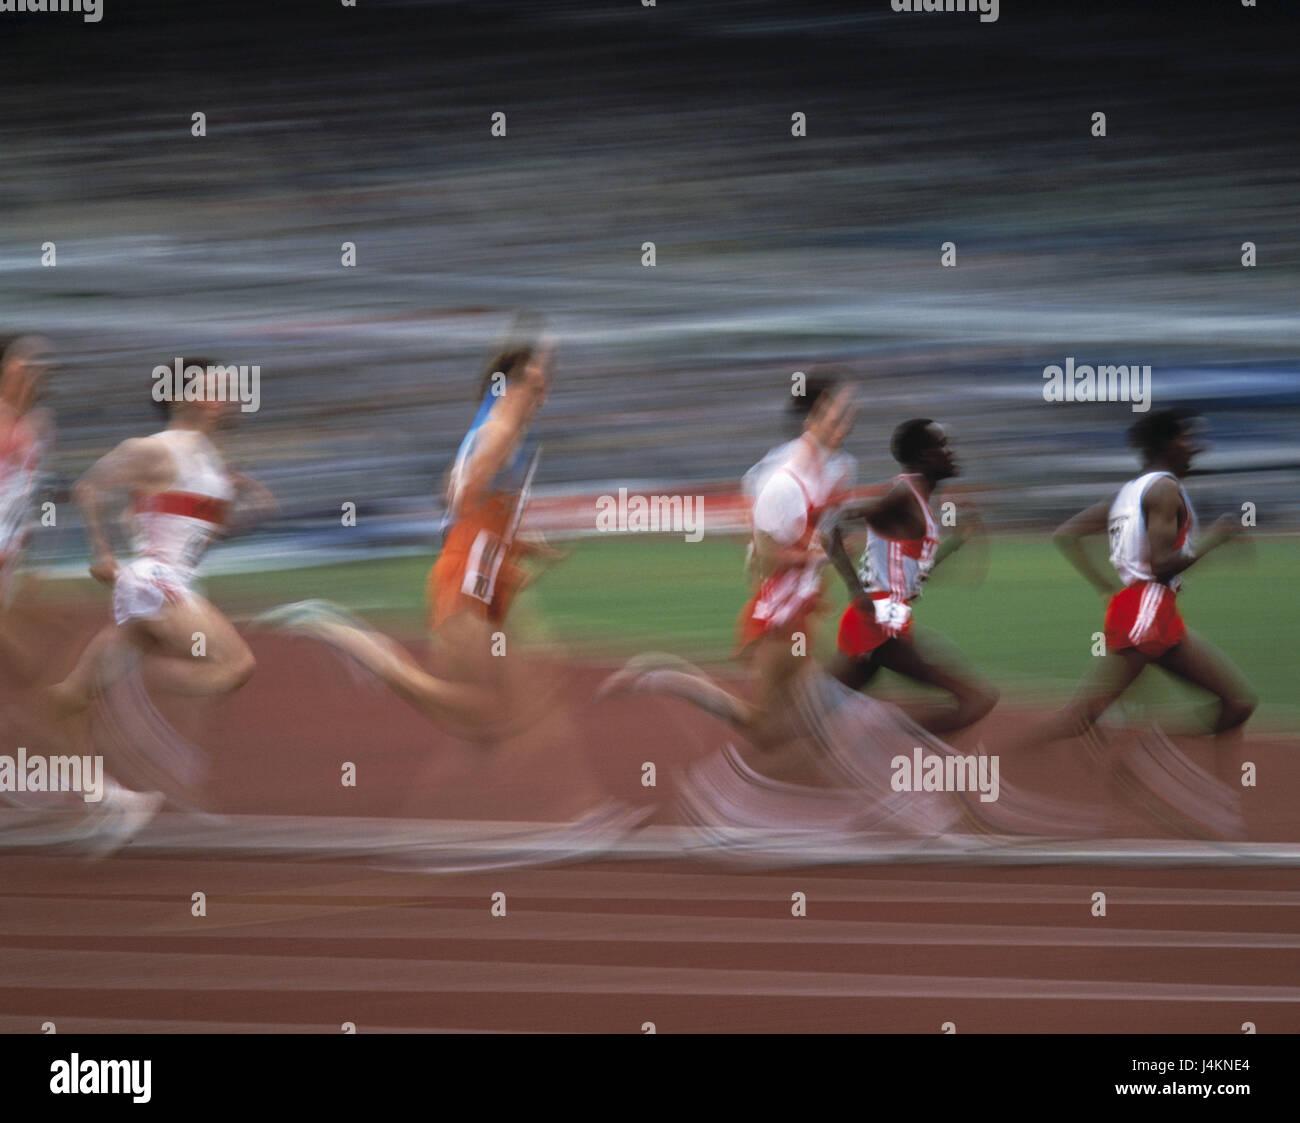 Dirt track, runner, motion, blur no model release athletics